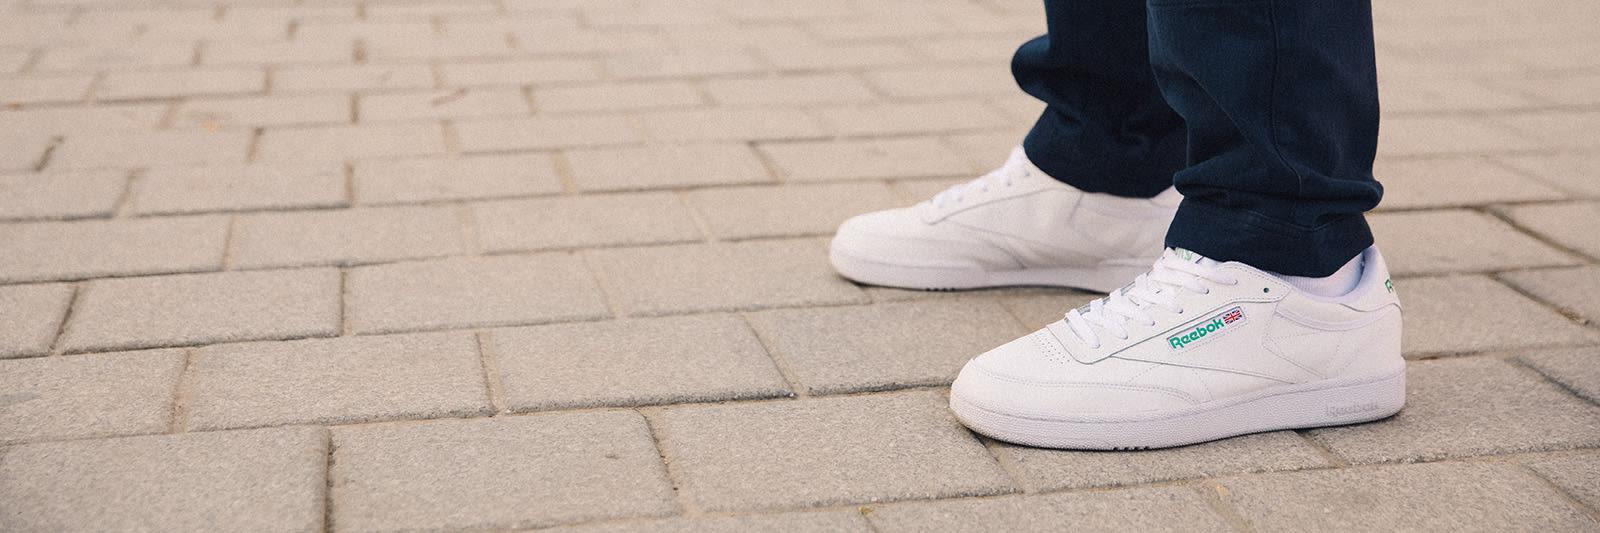 reebok white running sport shoes